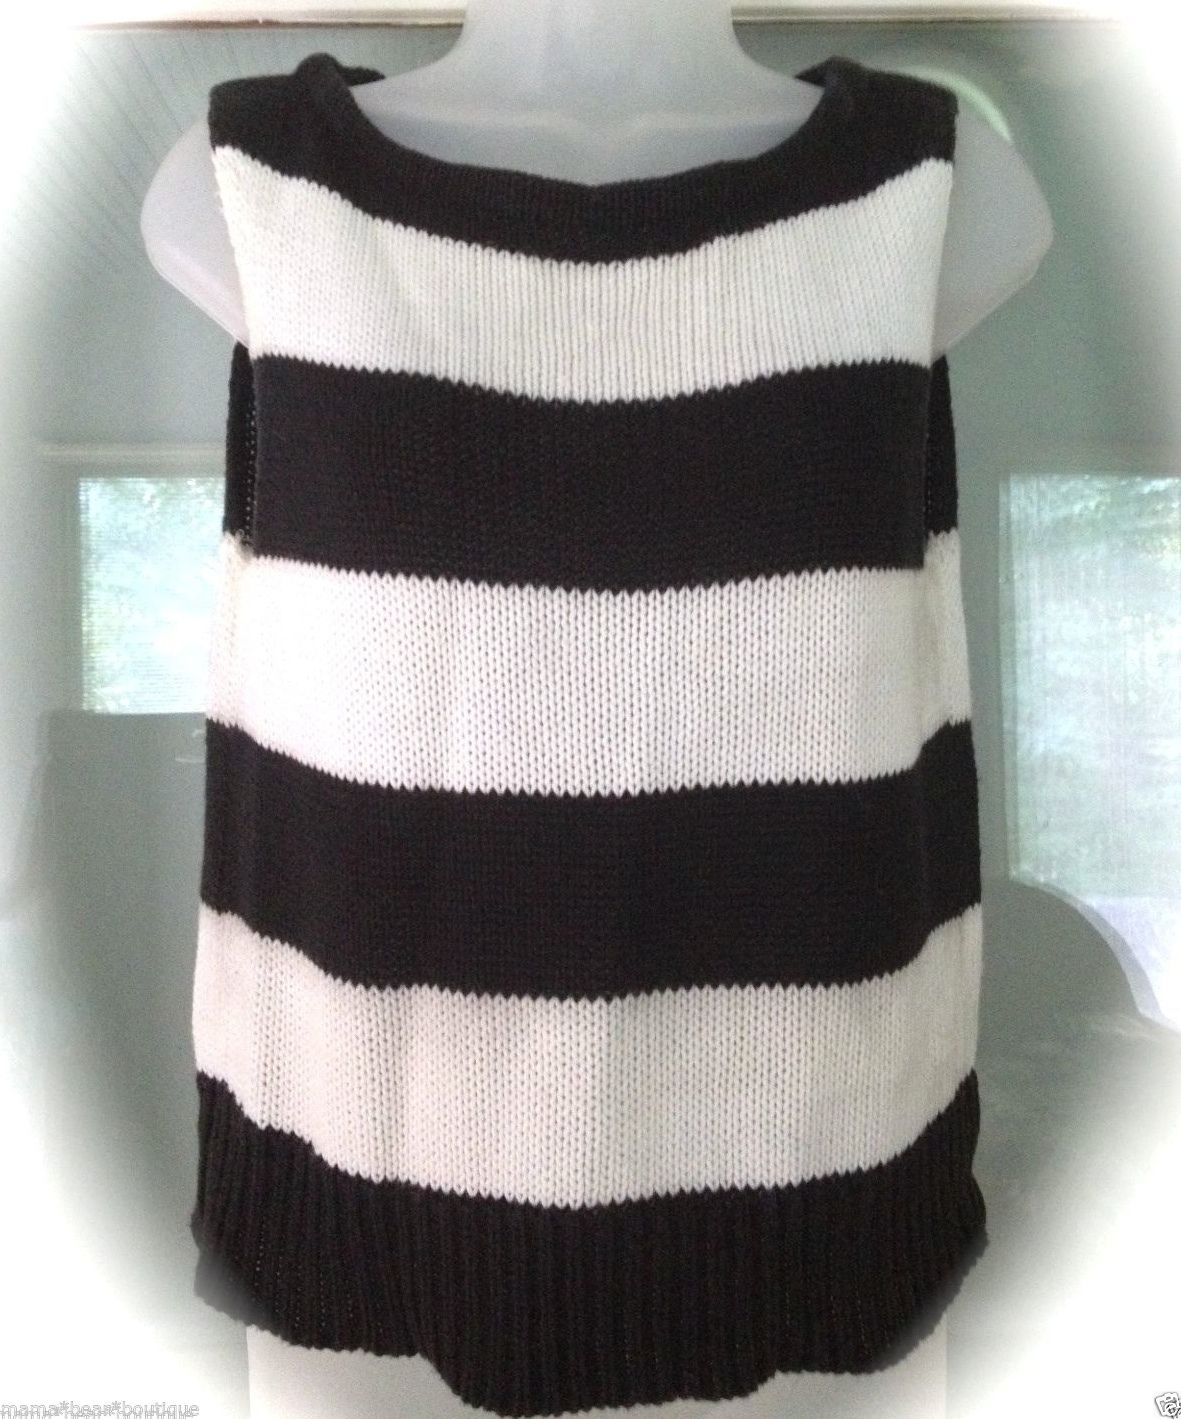 Newport News Navy Blue Striped Sweater Women Size M Sleeveless Vest - $13.85